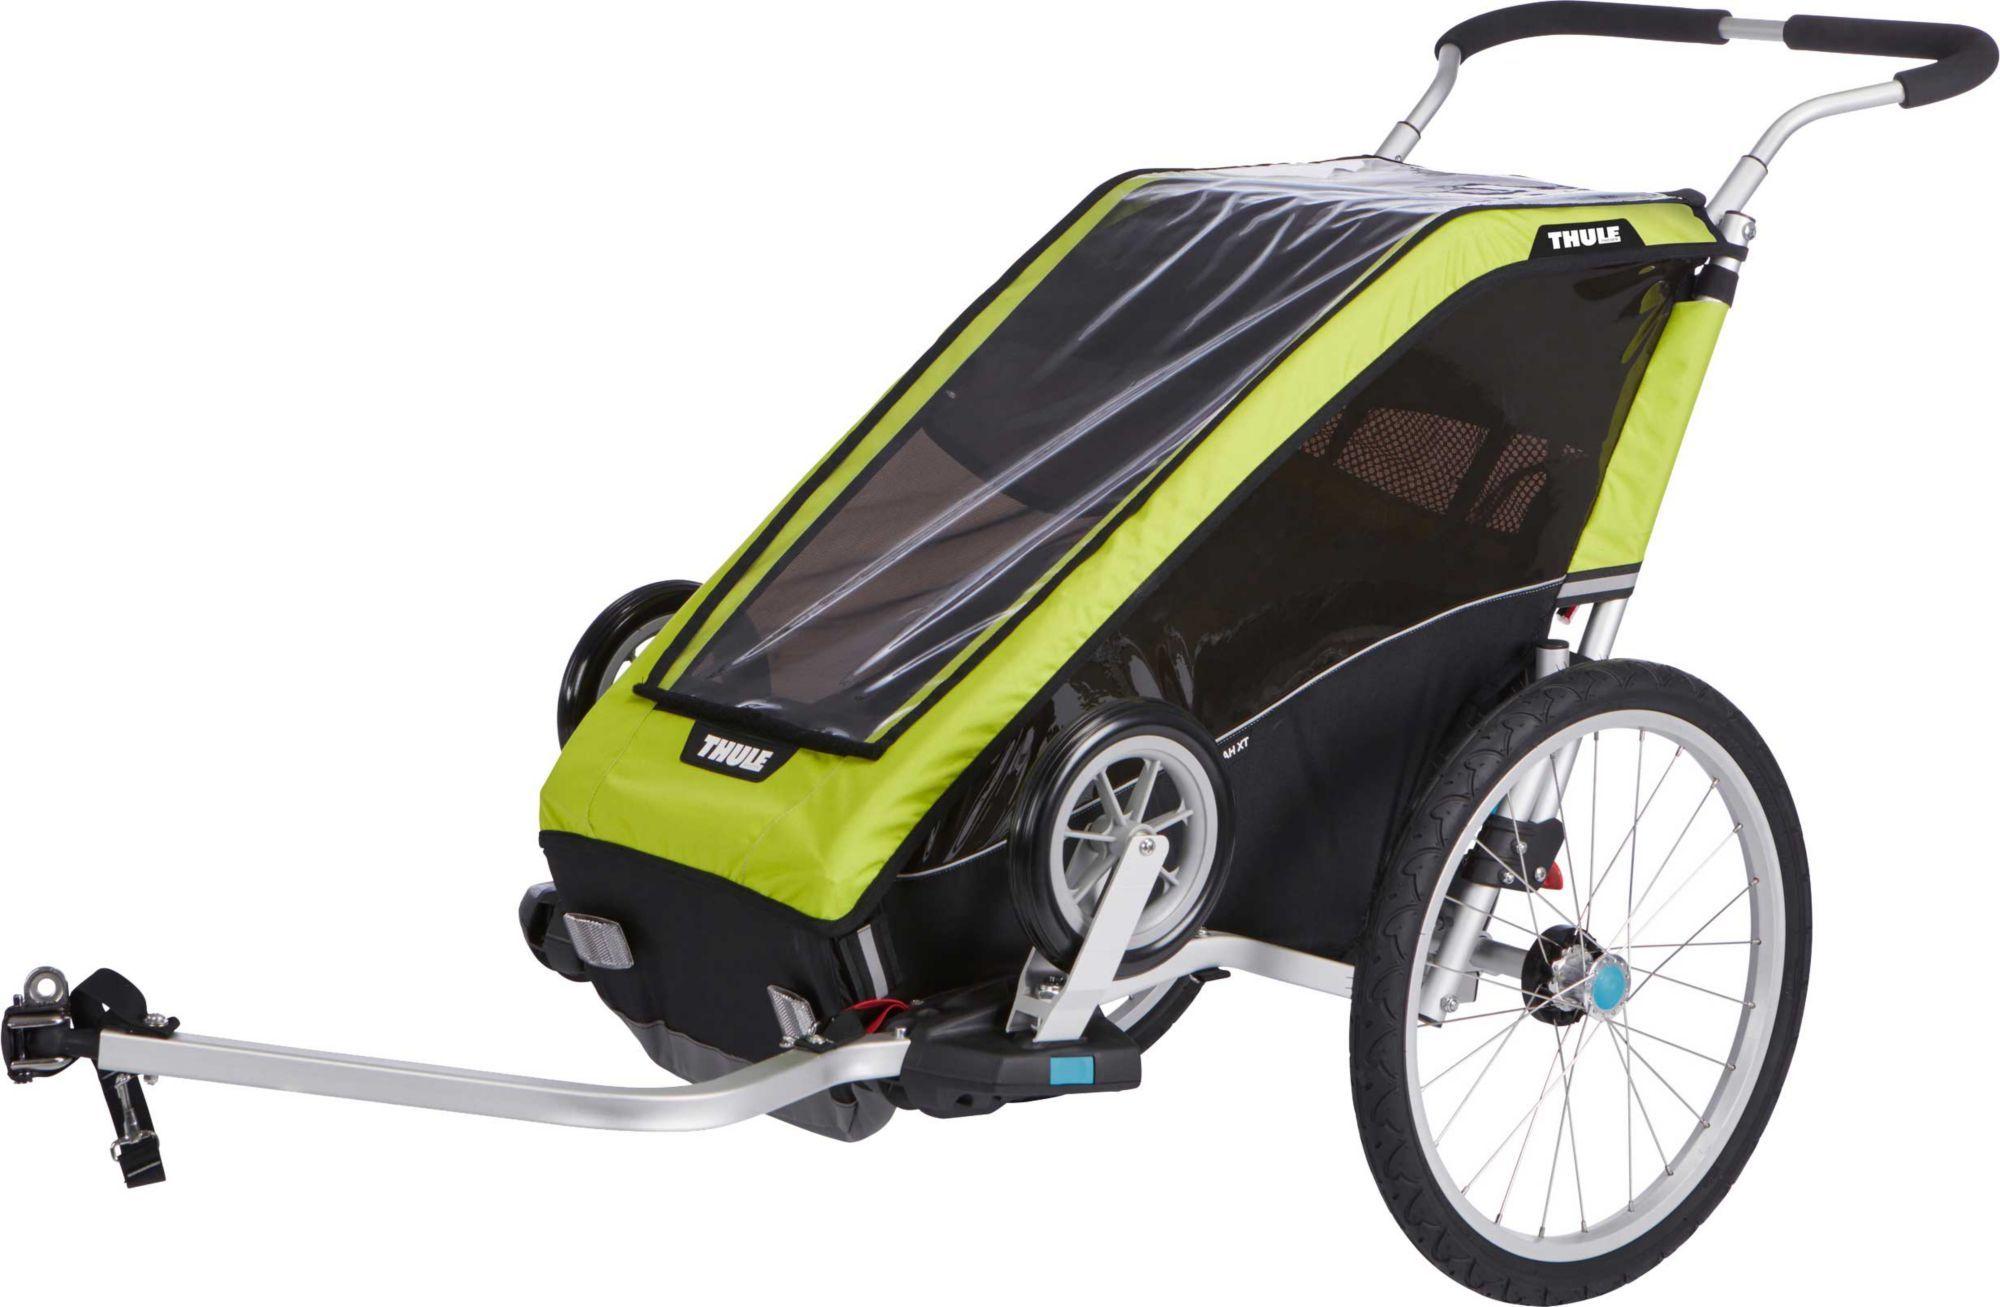 Thule Chariot Cheetah Xt 1 Single Bike Trailer And Stroller Thule Chariot Bike Trailer Jogging Stroller